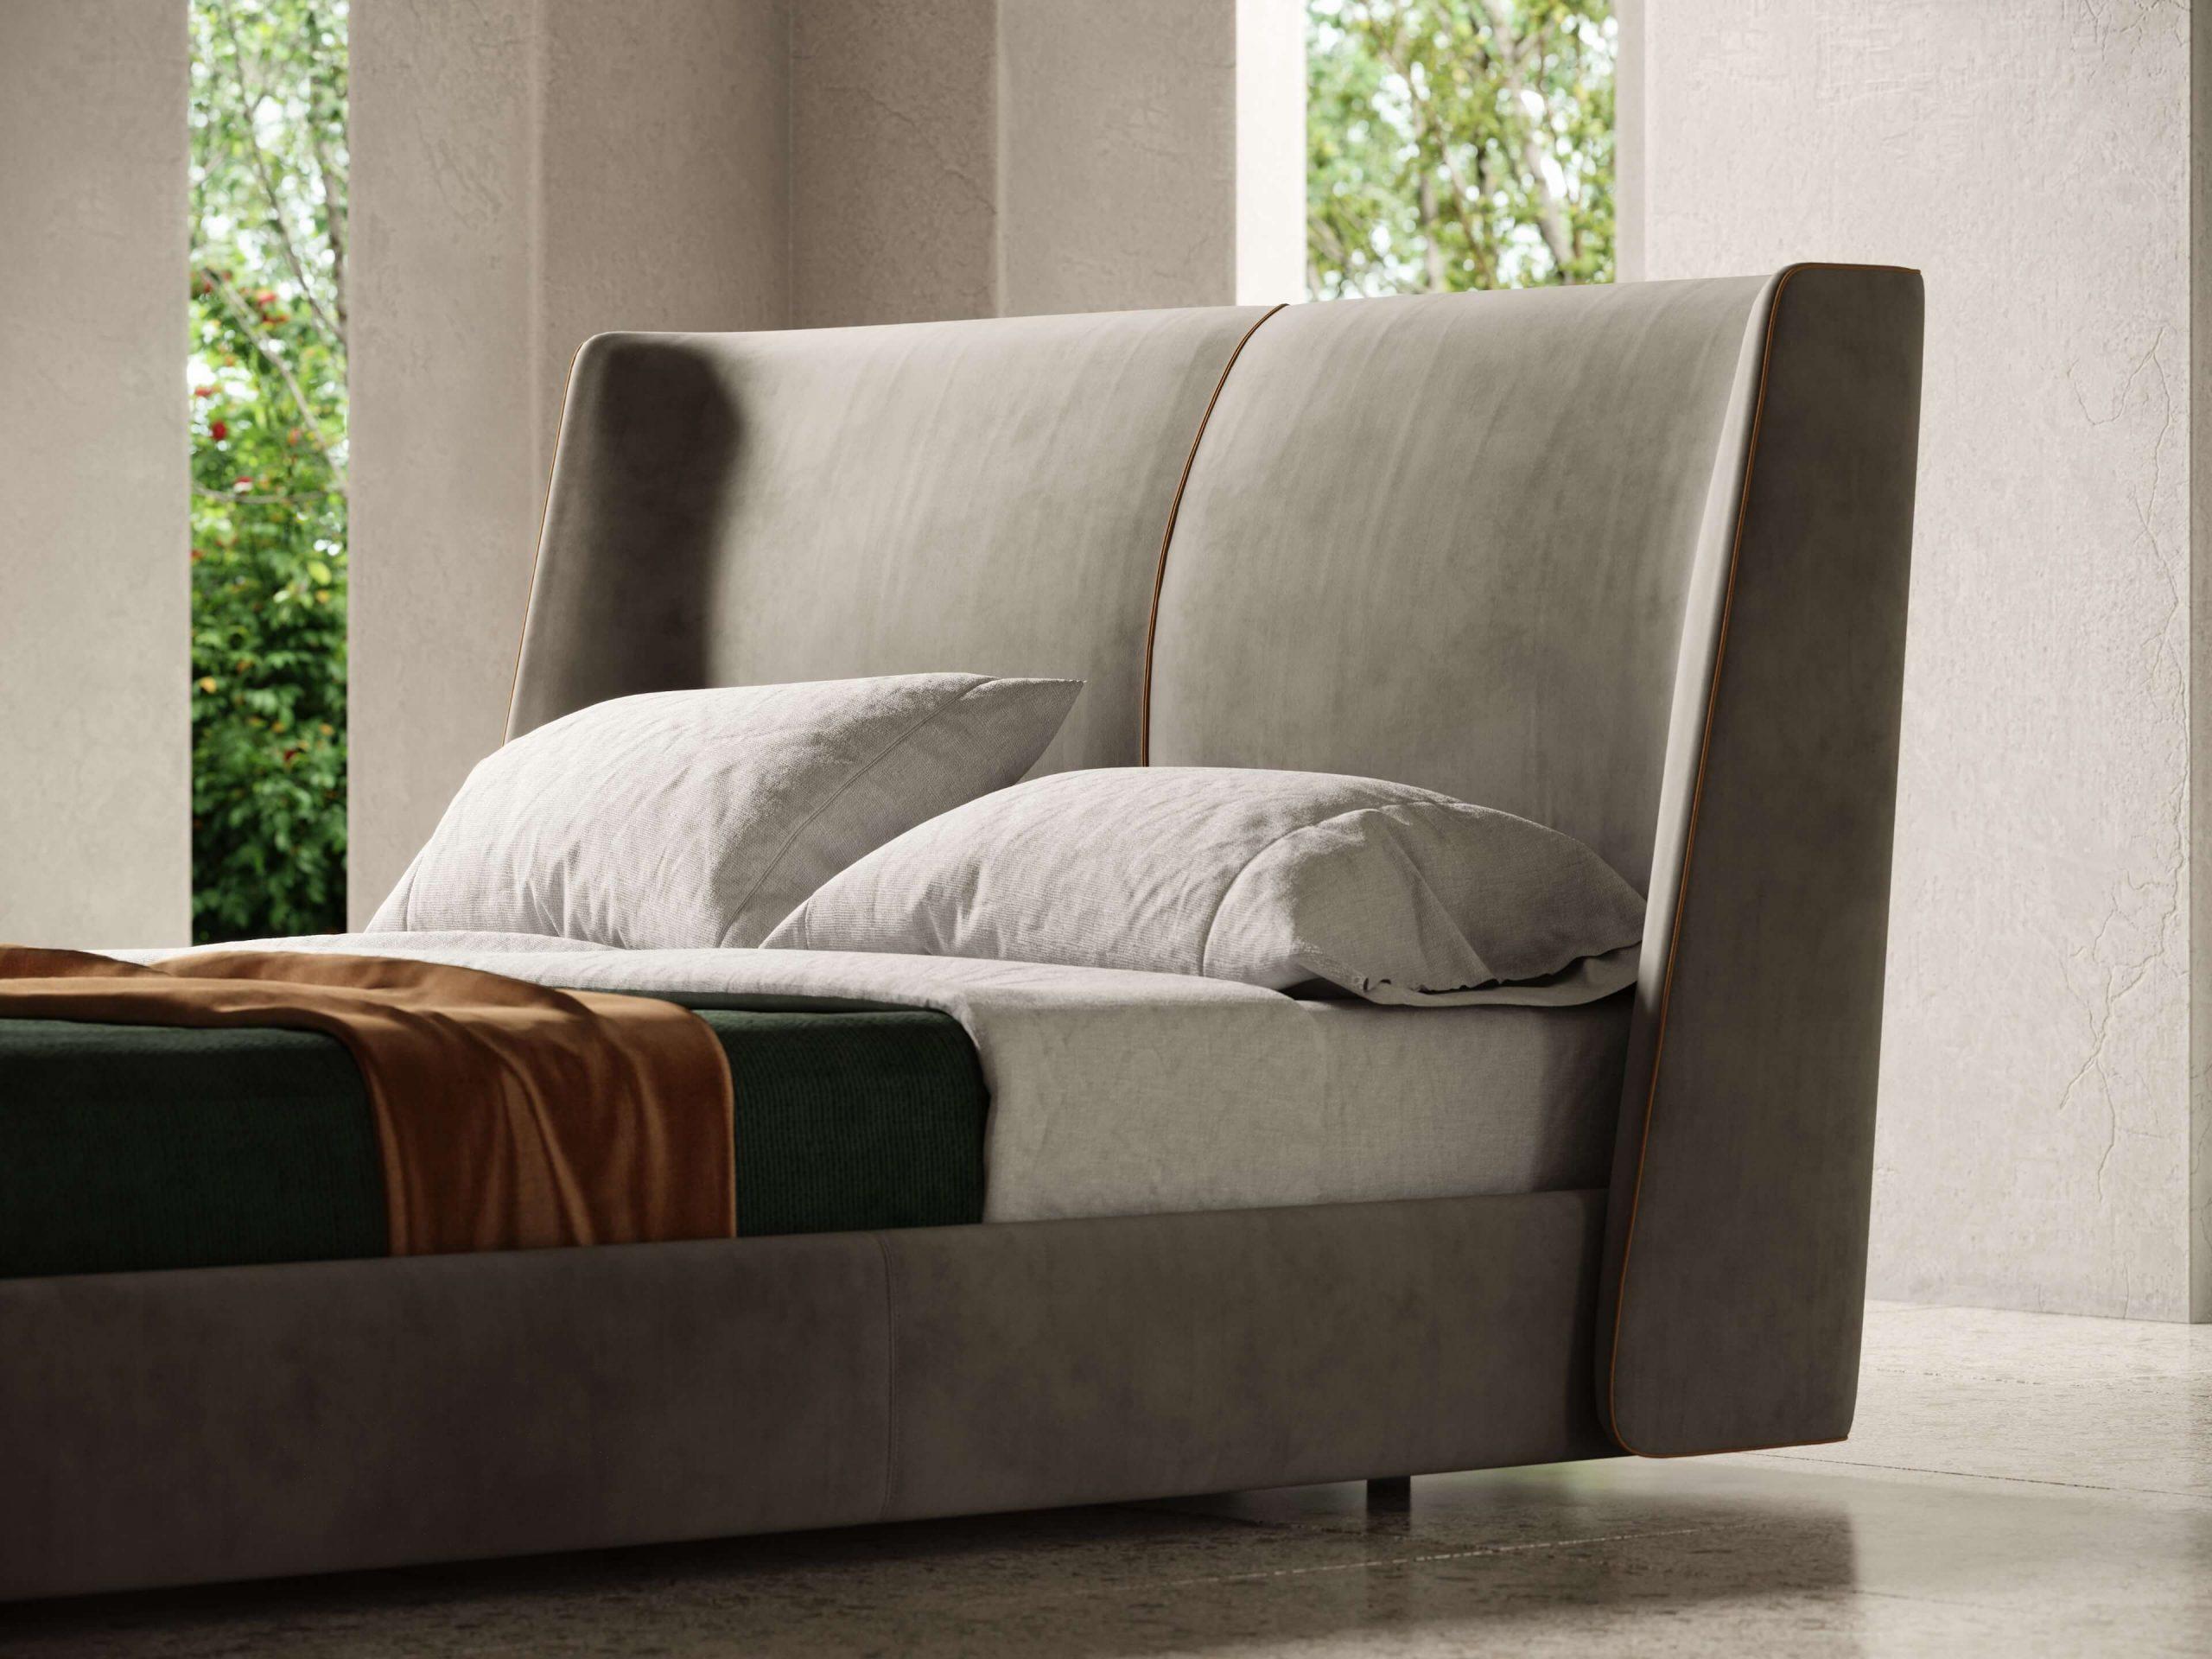 echo-bed-velvet-headboard-grey-velvet-master-bedroom-interior-design-ideas-furniture-domkapa